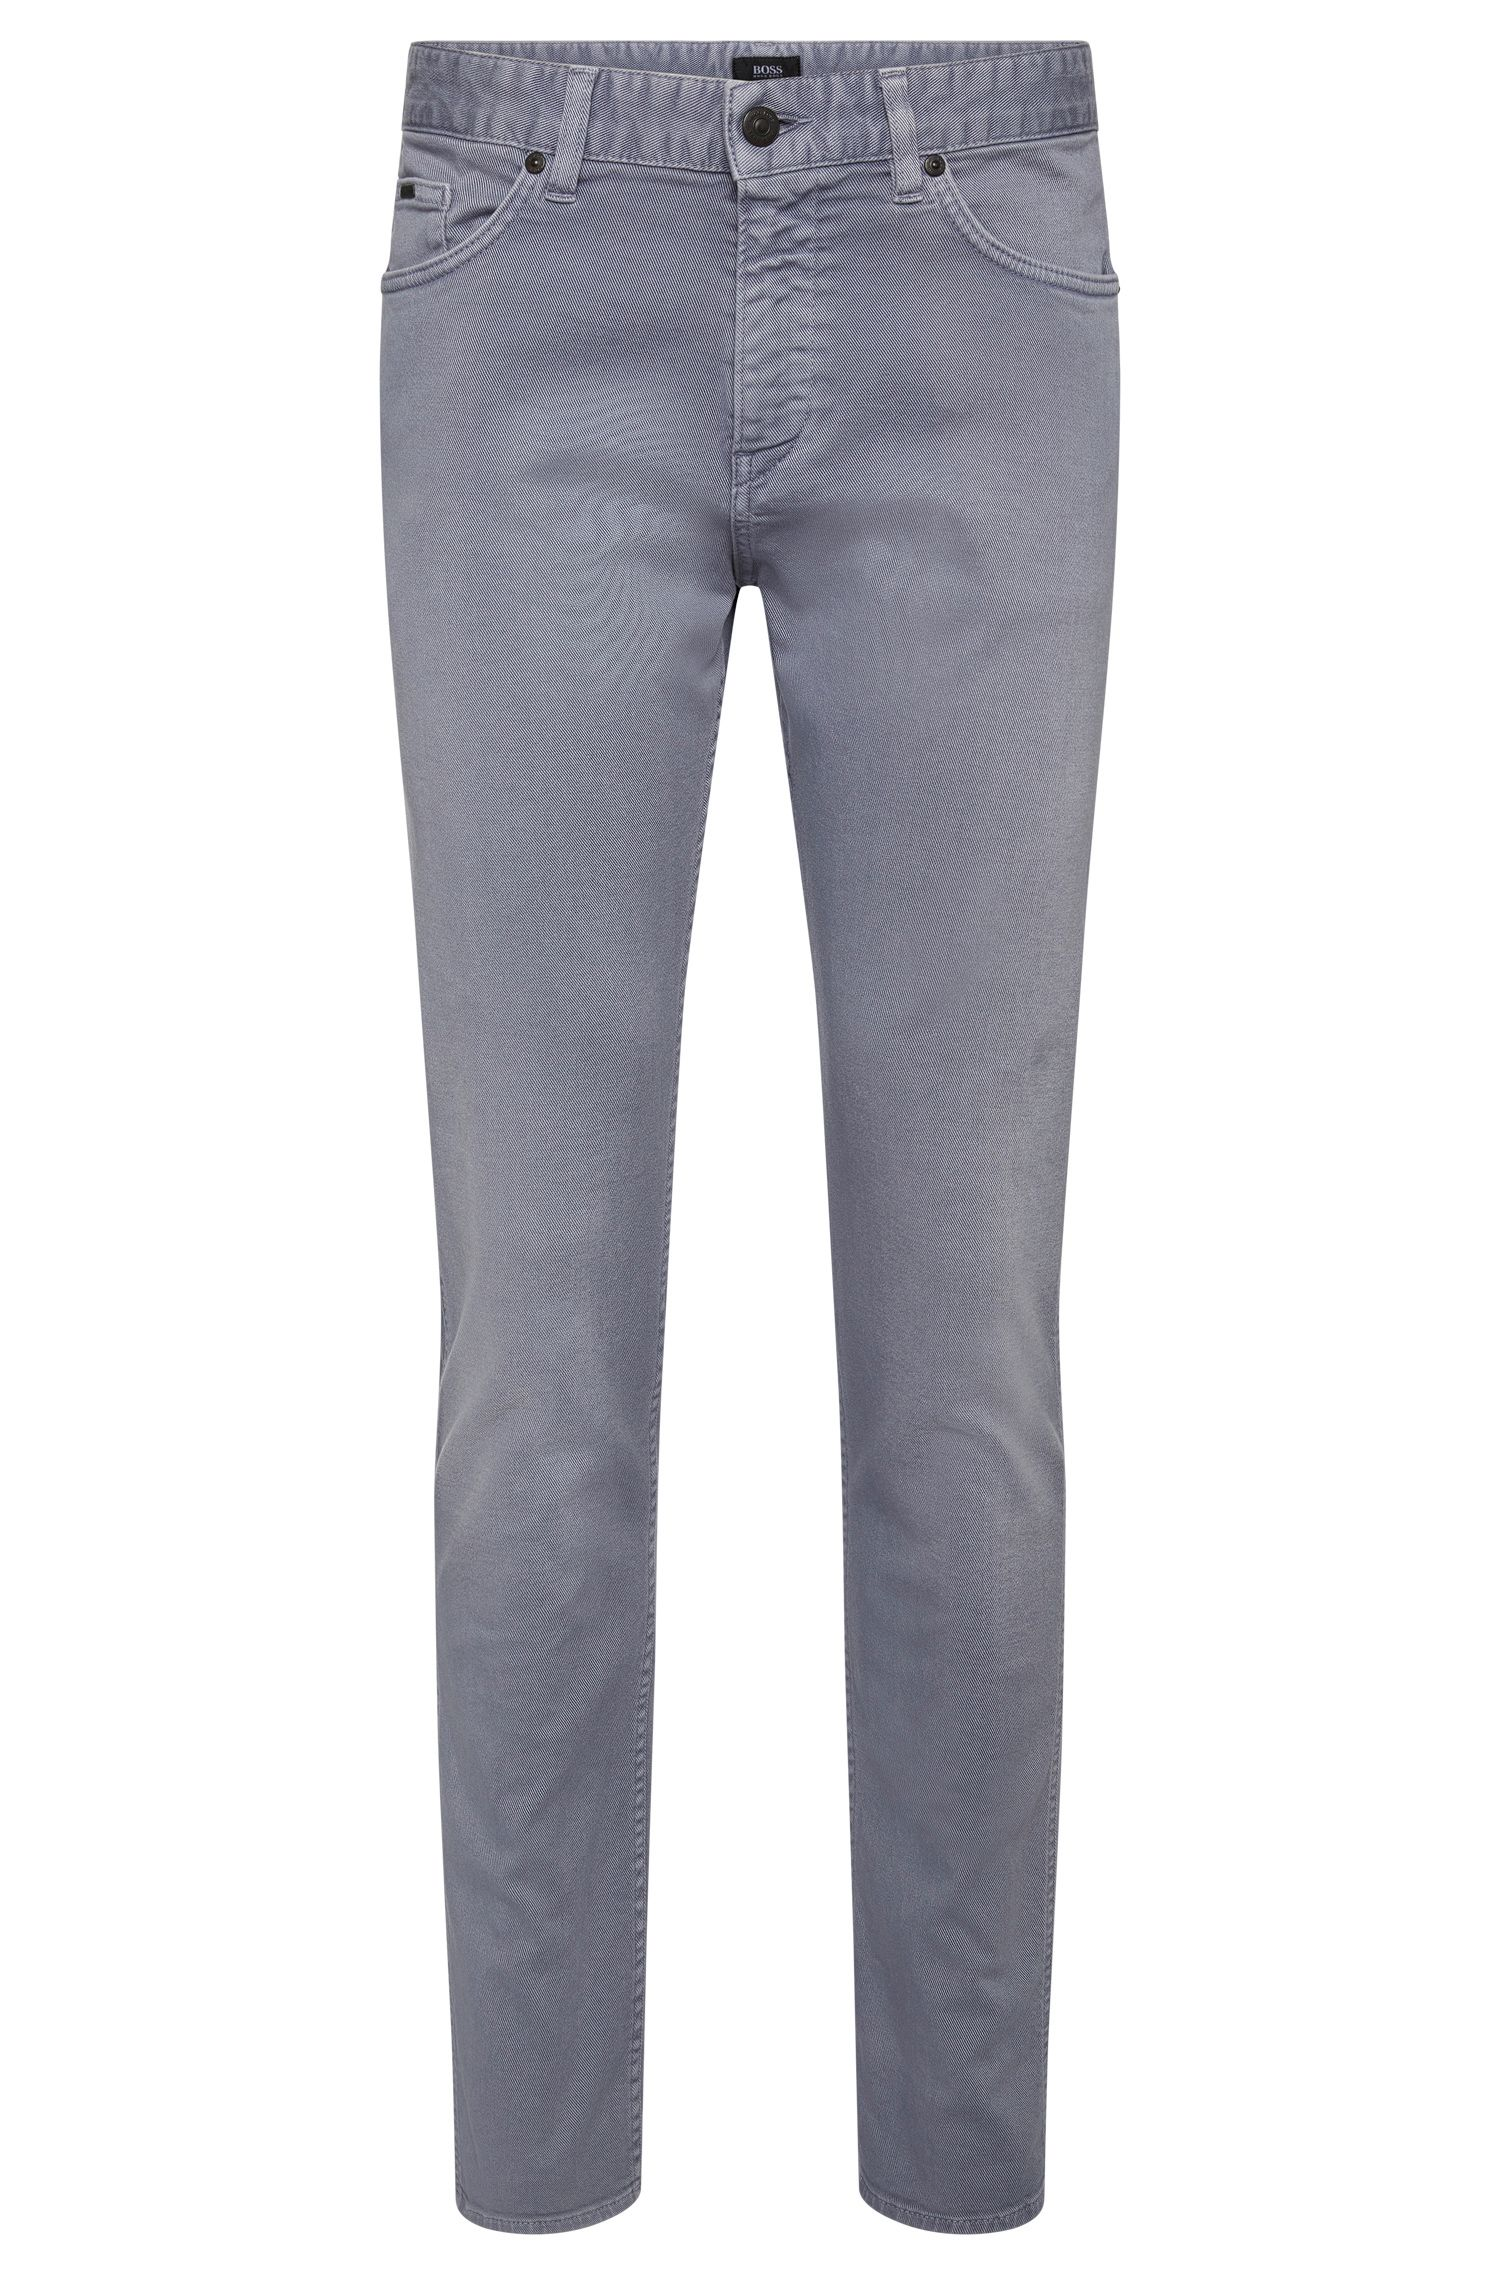 8.5 oz Stretch Cotton Blend Jeans, Slim Leg | Delaware